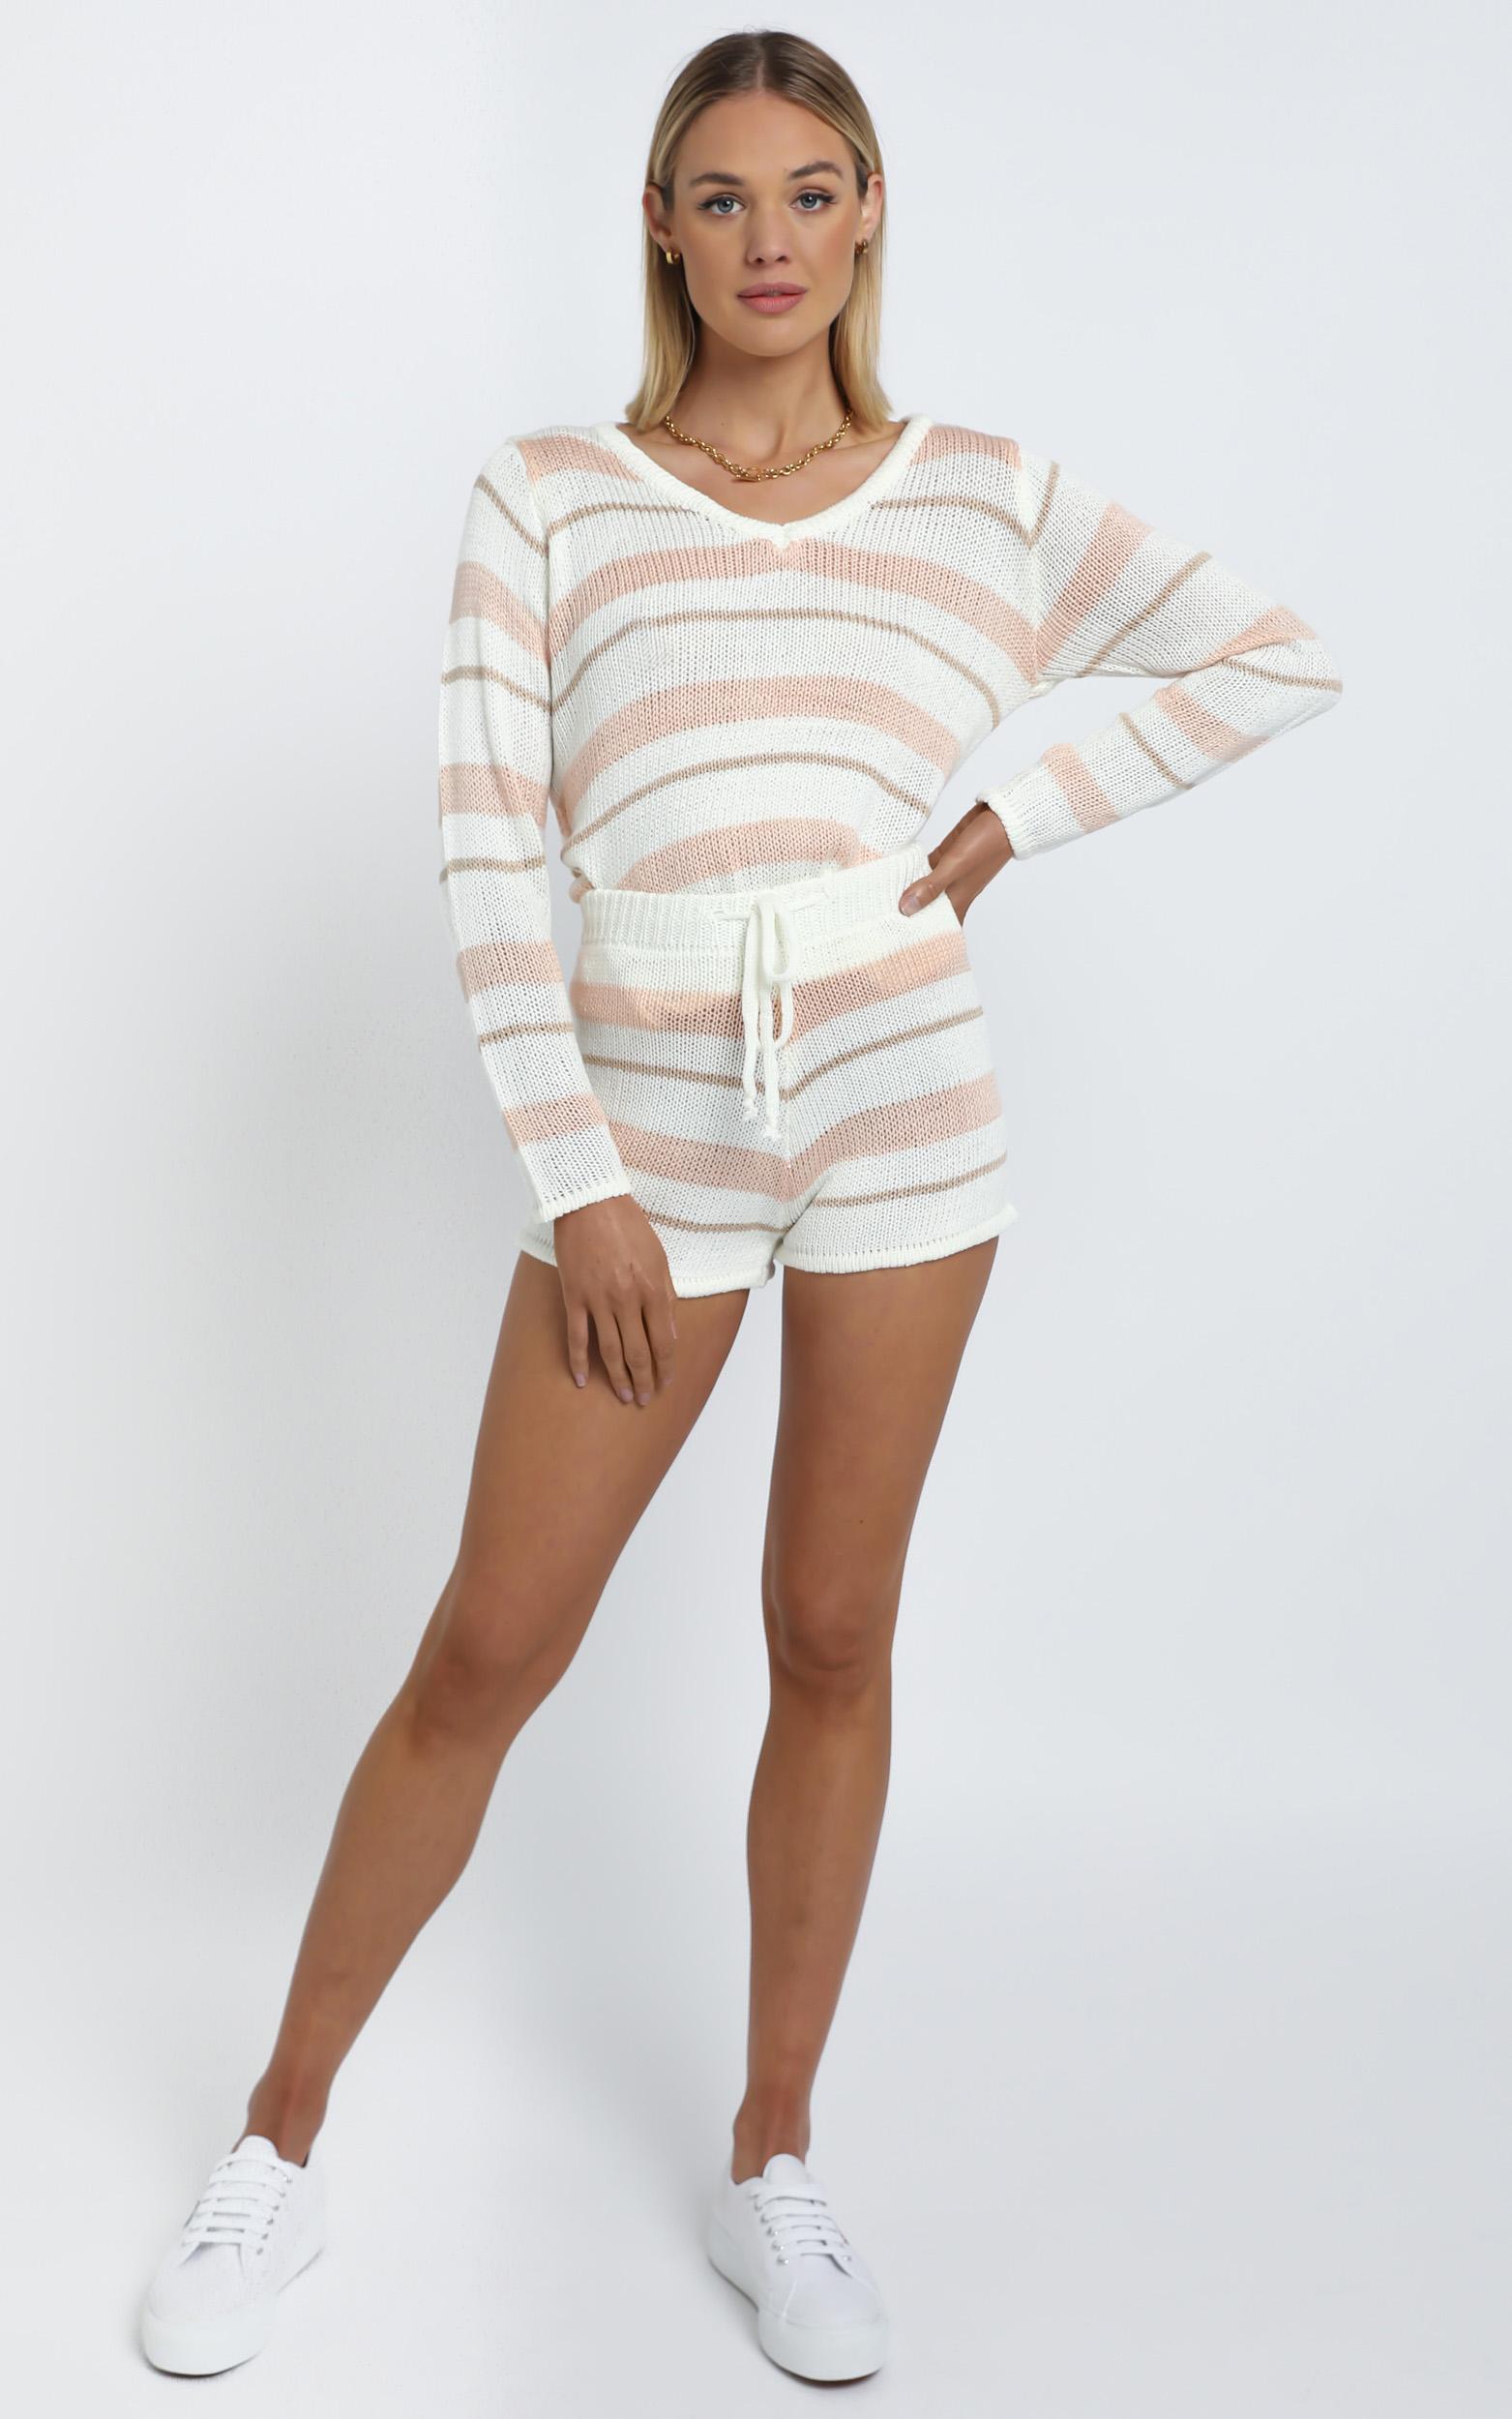 Callahan Knit Two Piece Set in Beige Stripe - L, Beige, hi-res image number null